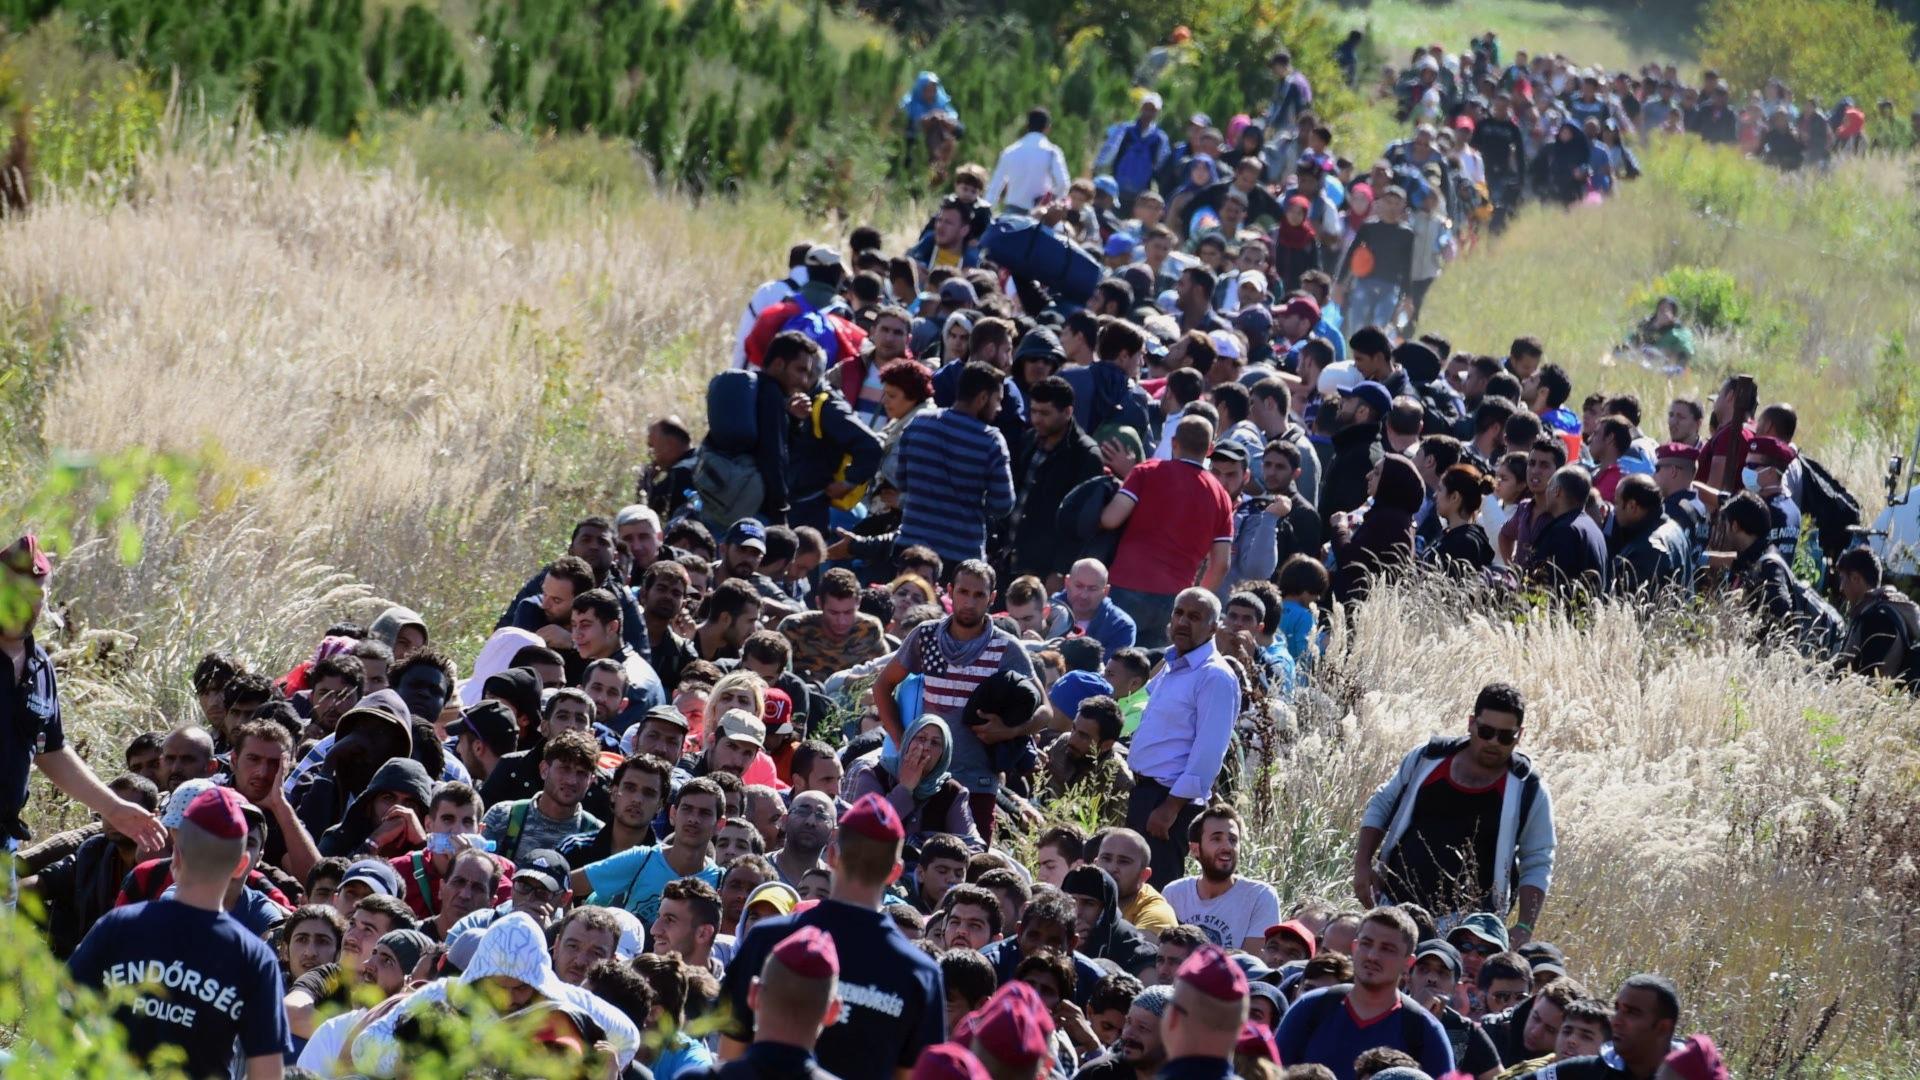 European leaders struggle over deep splits on migrant crisis efforts